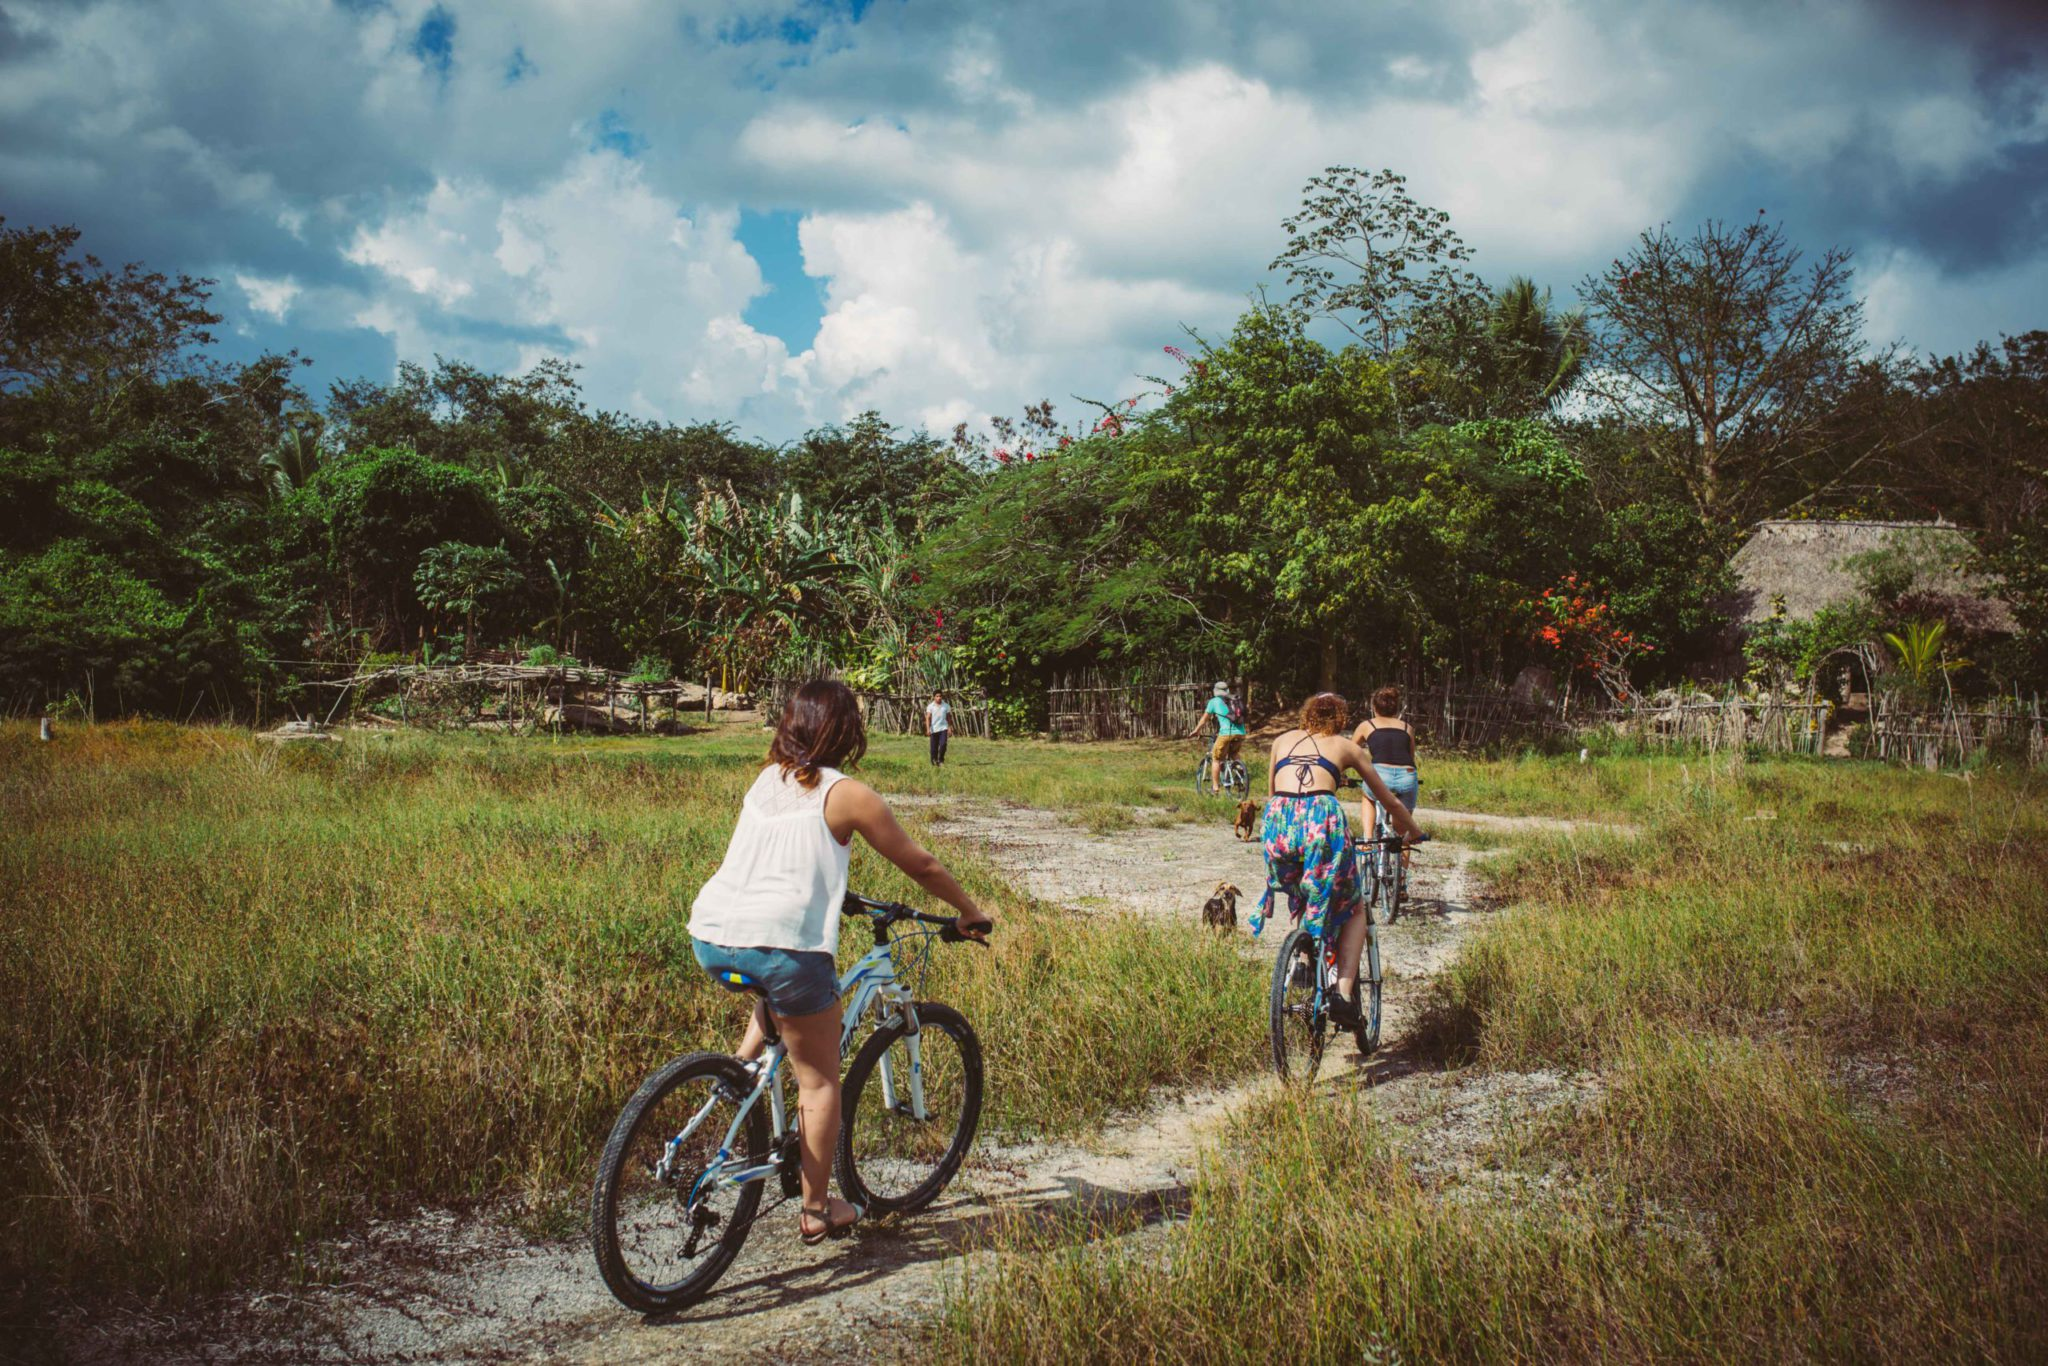 Mayan Backroads Bike Tour – Mexico Biking Adventure in the jungle